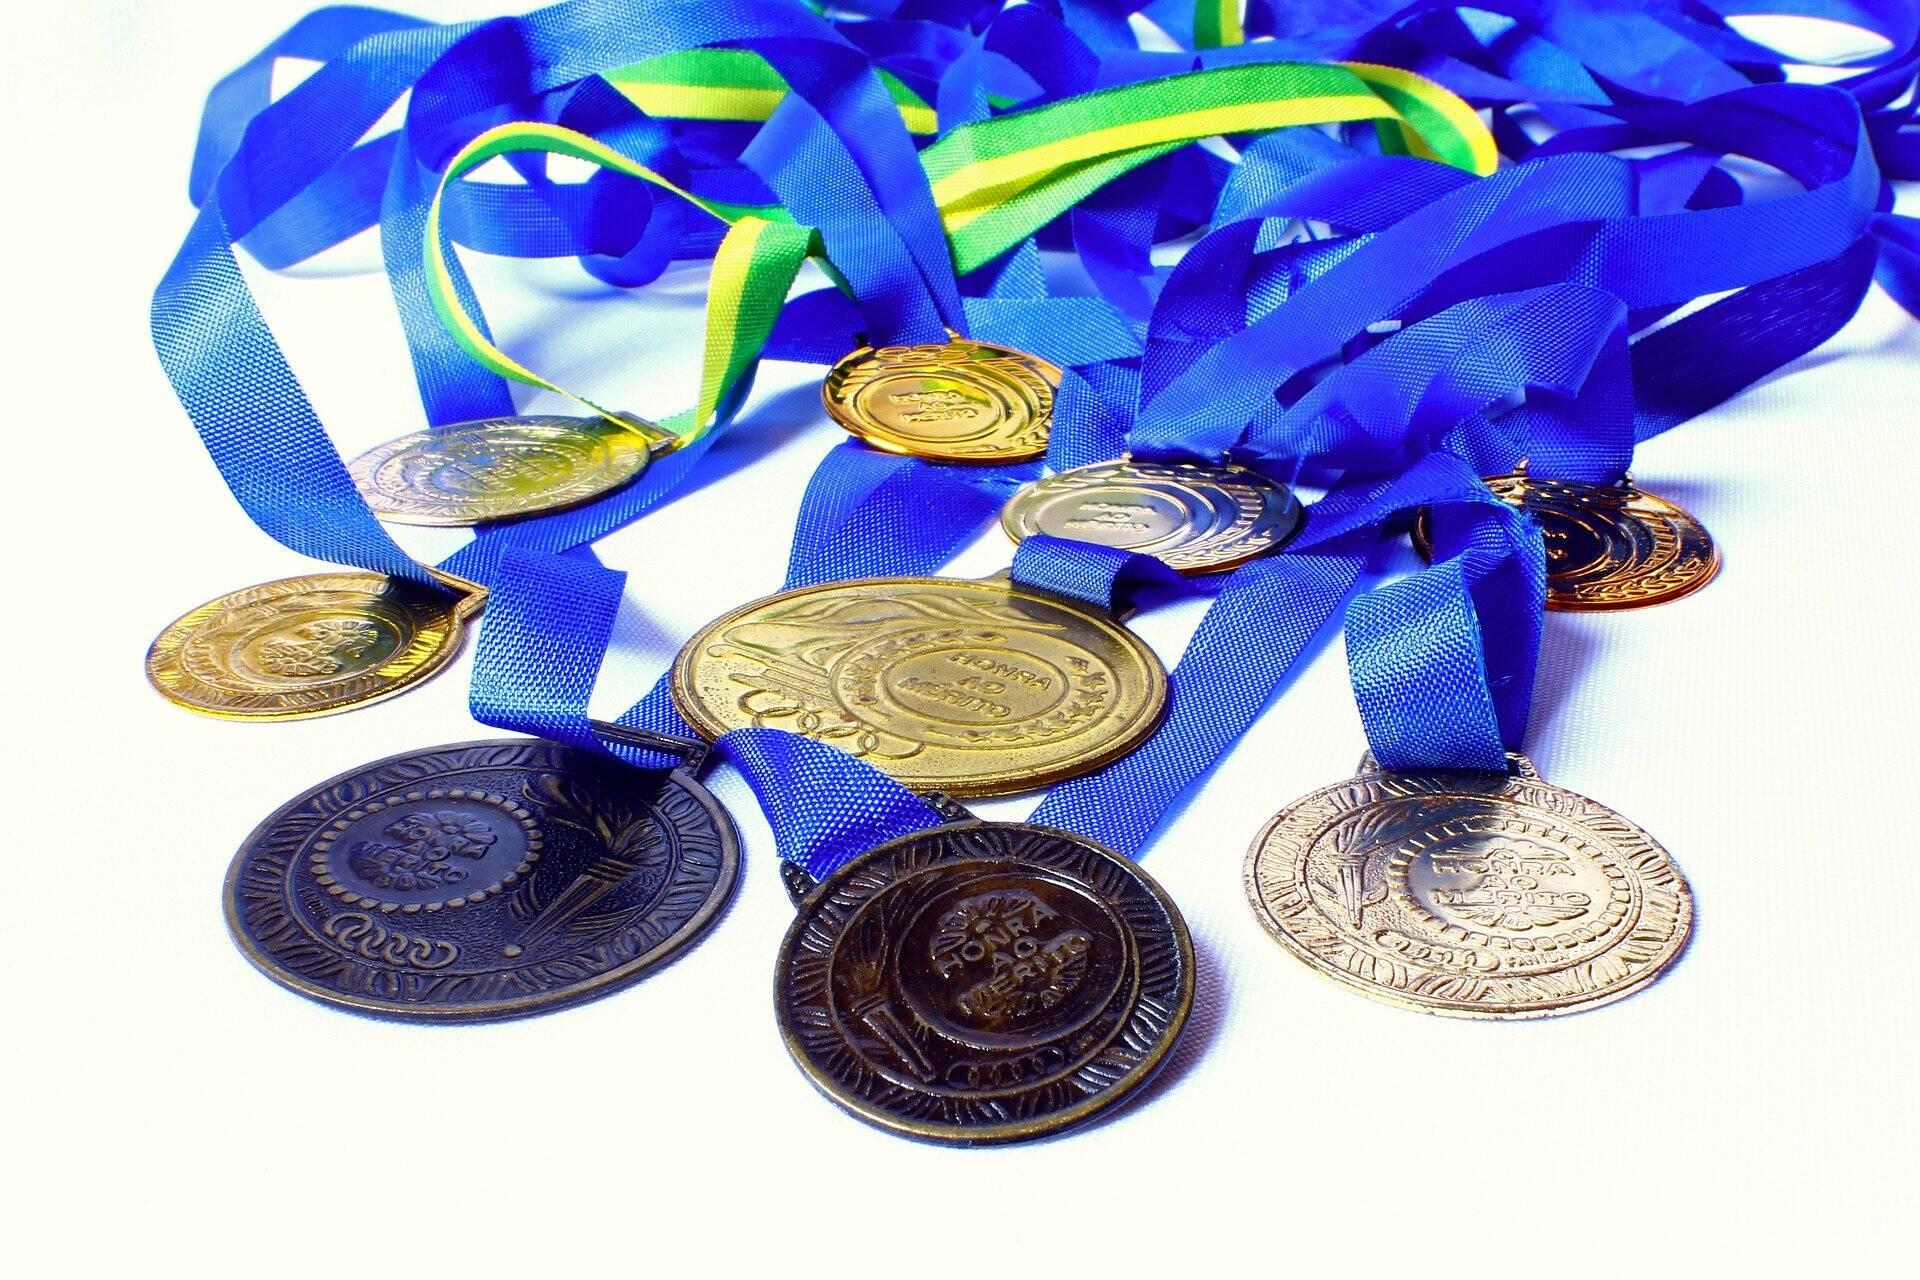 O Brasil tem 10 medalhas (Foto: pixabay)